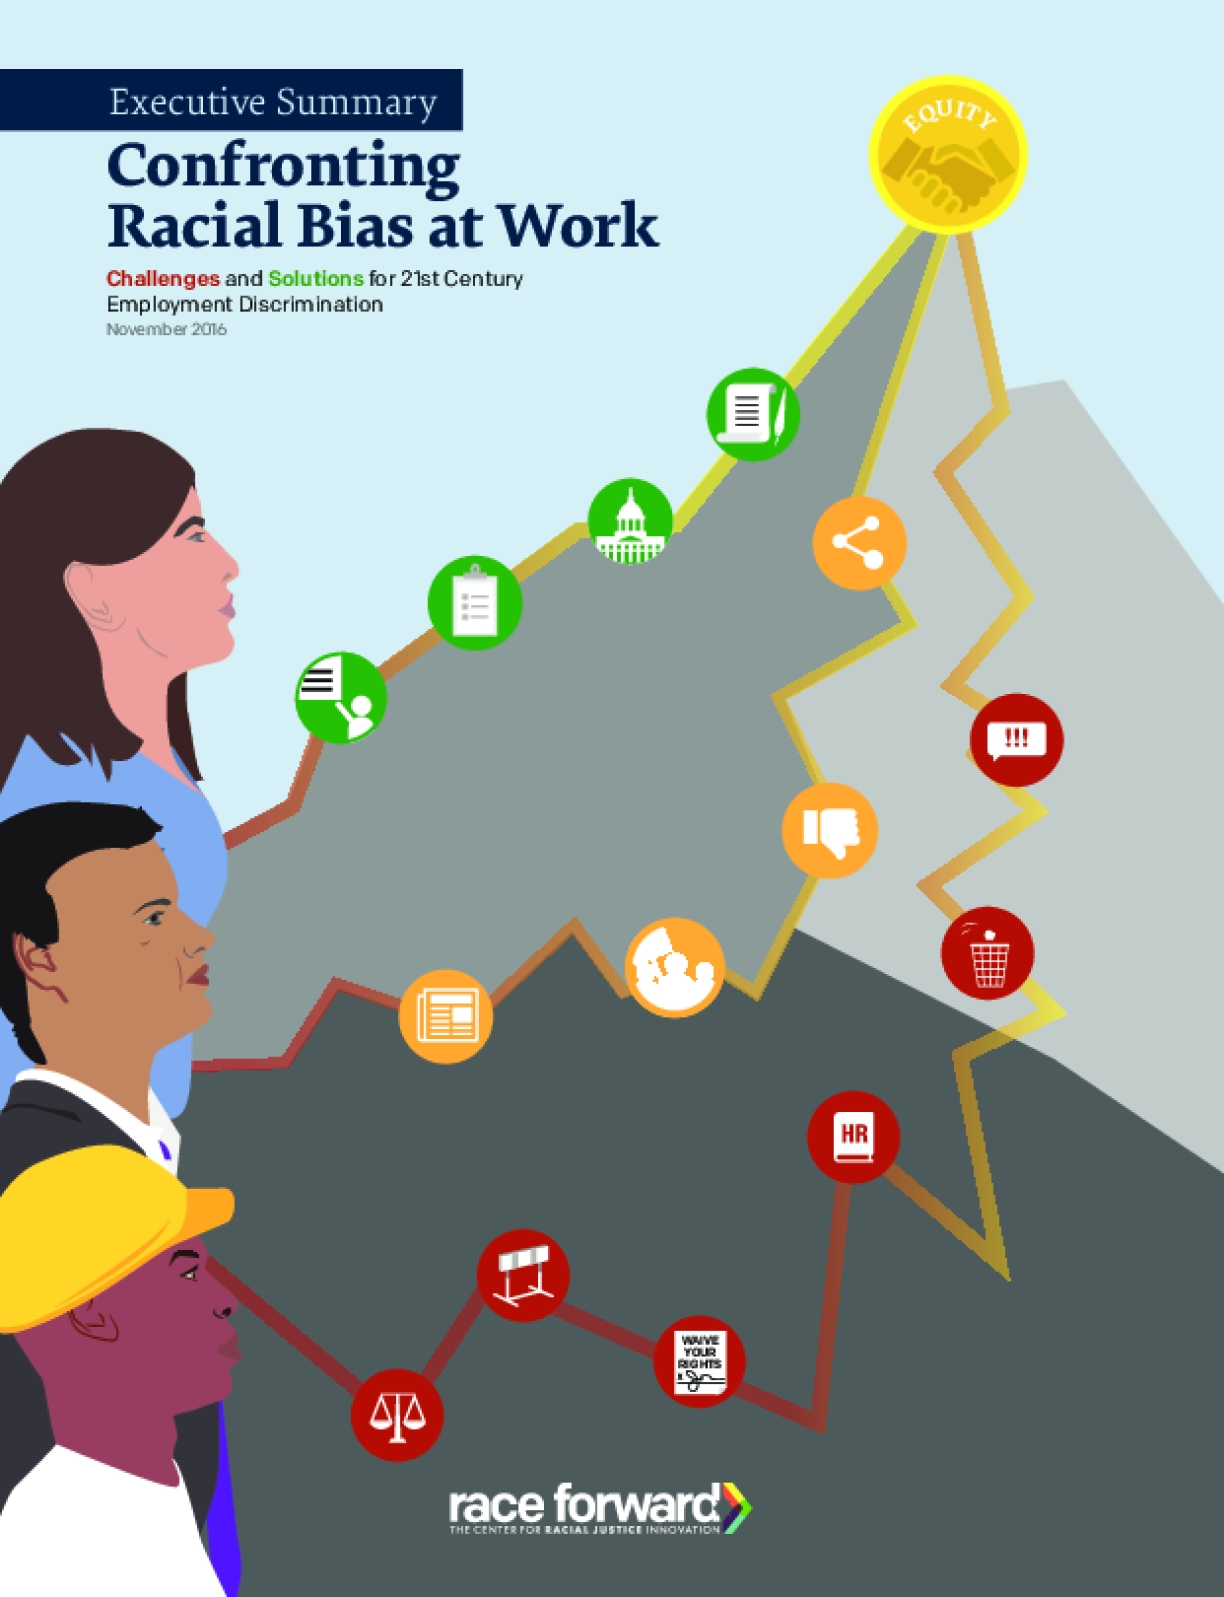 Confronting Racial Bias at Work (Executive Summary)